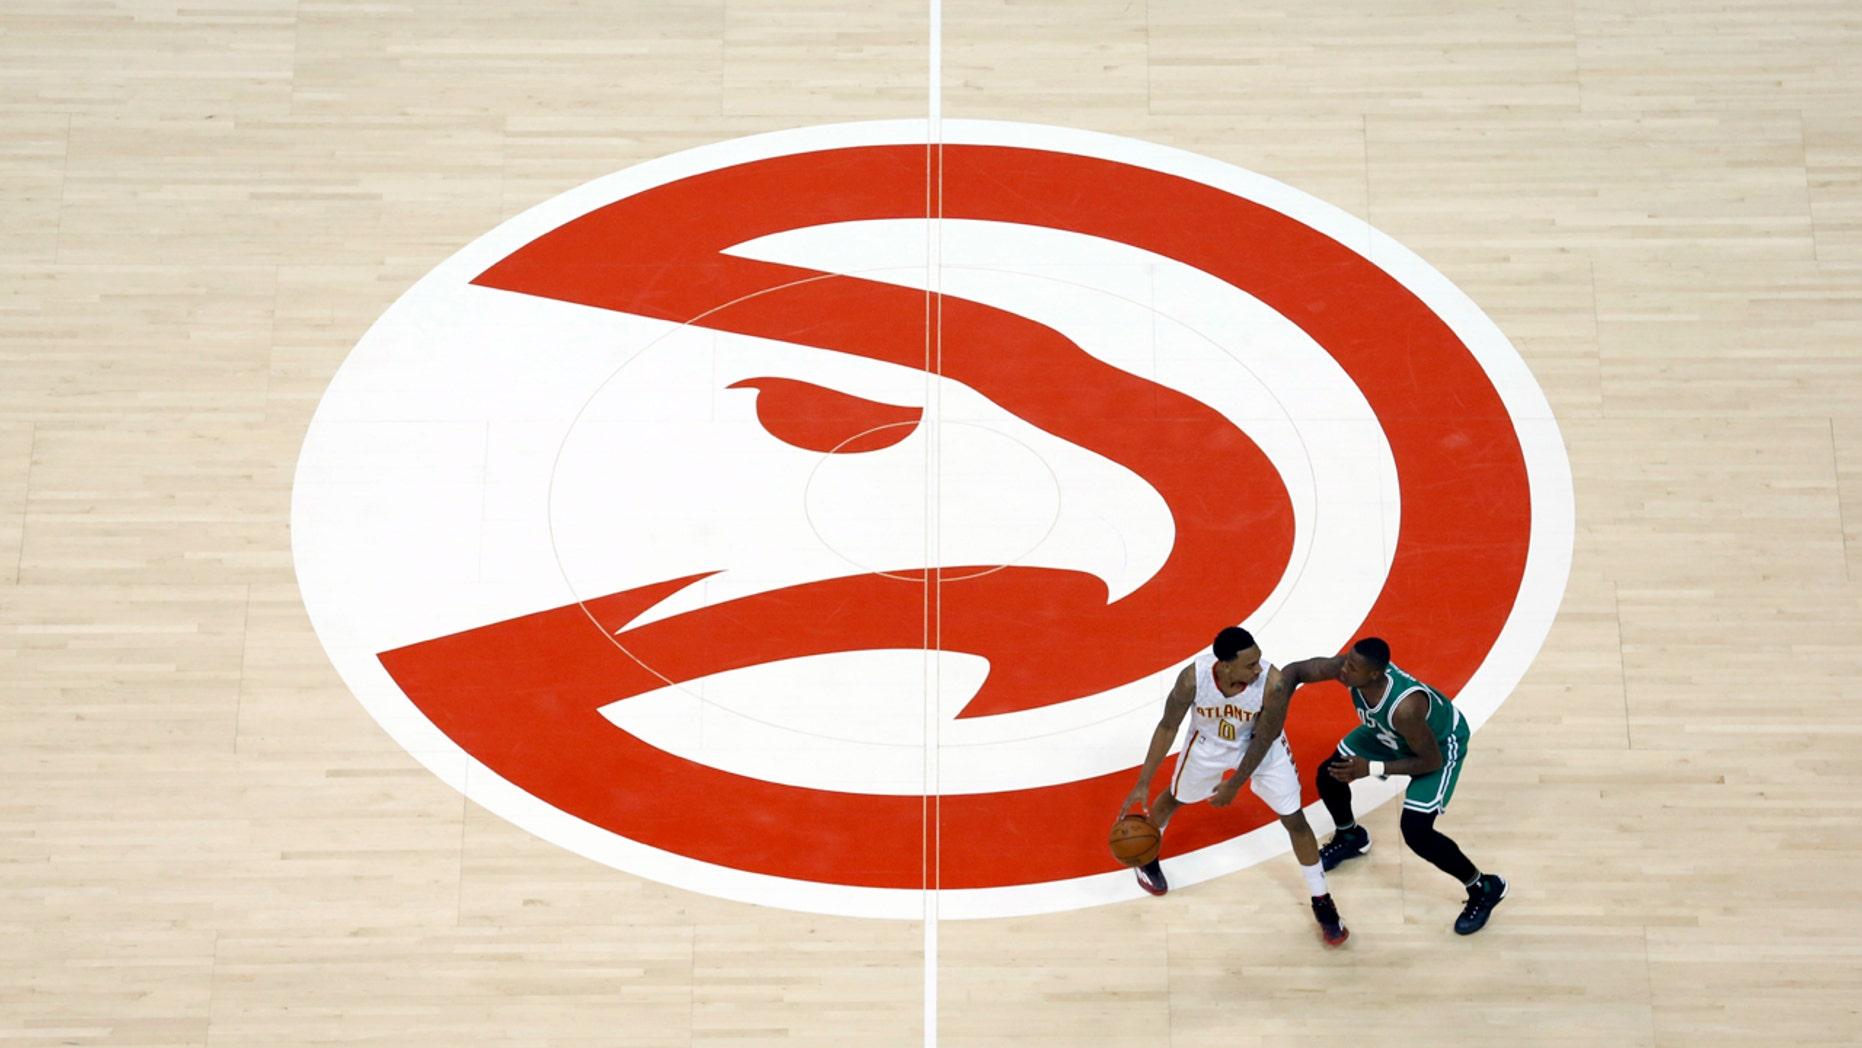 The Hawks have described Margo Kline's lawsuit as 'baseless.'